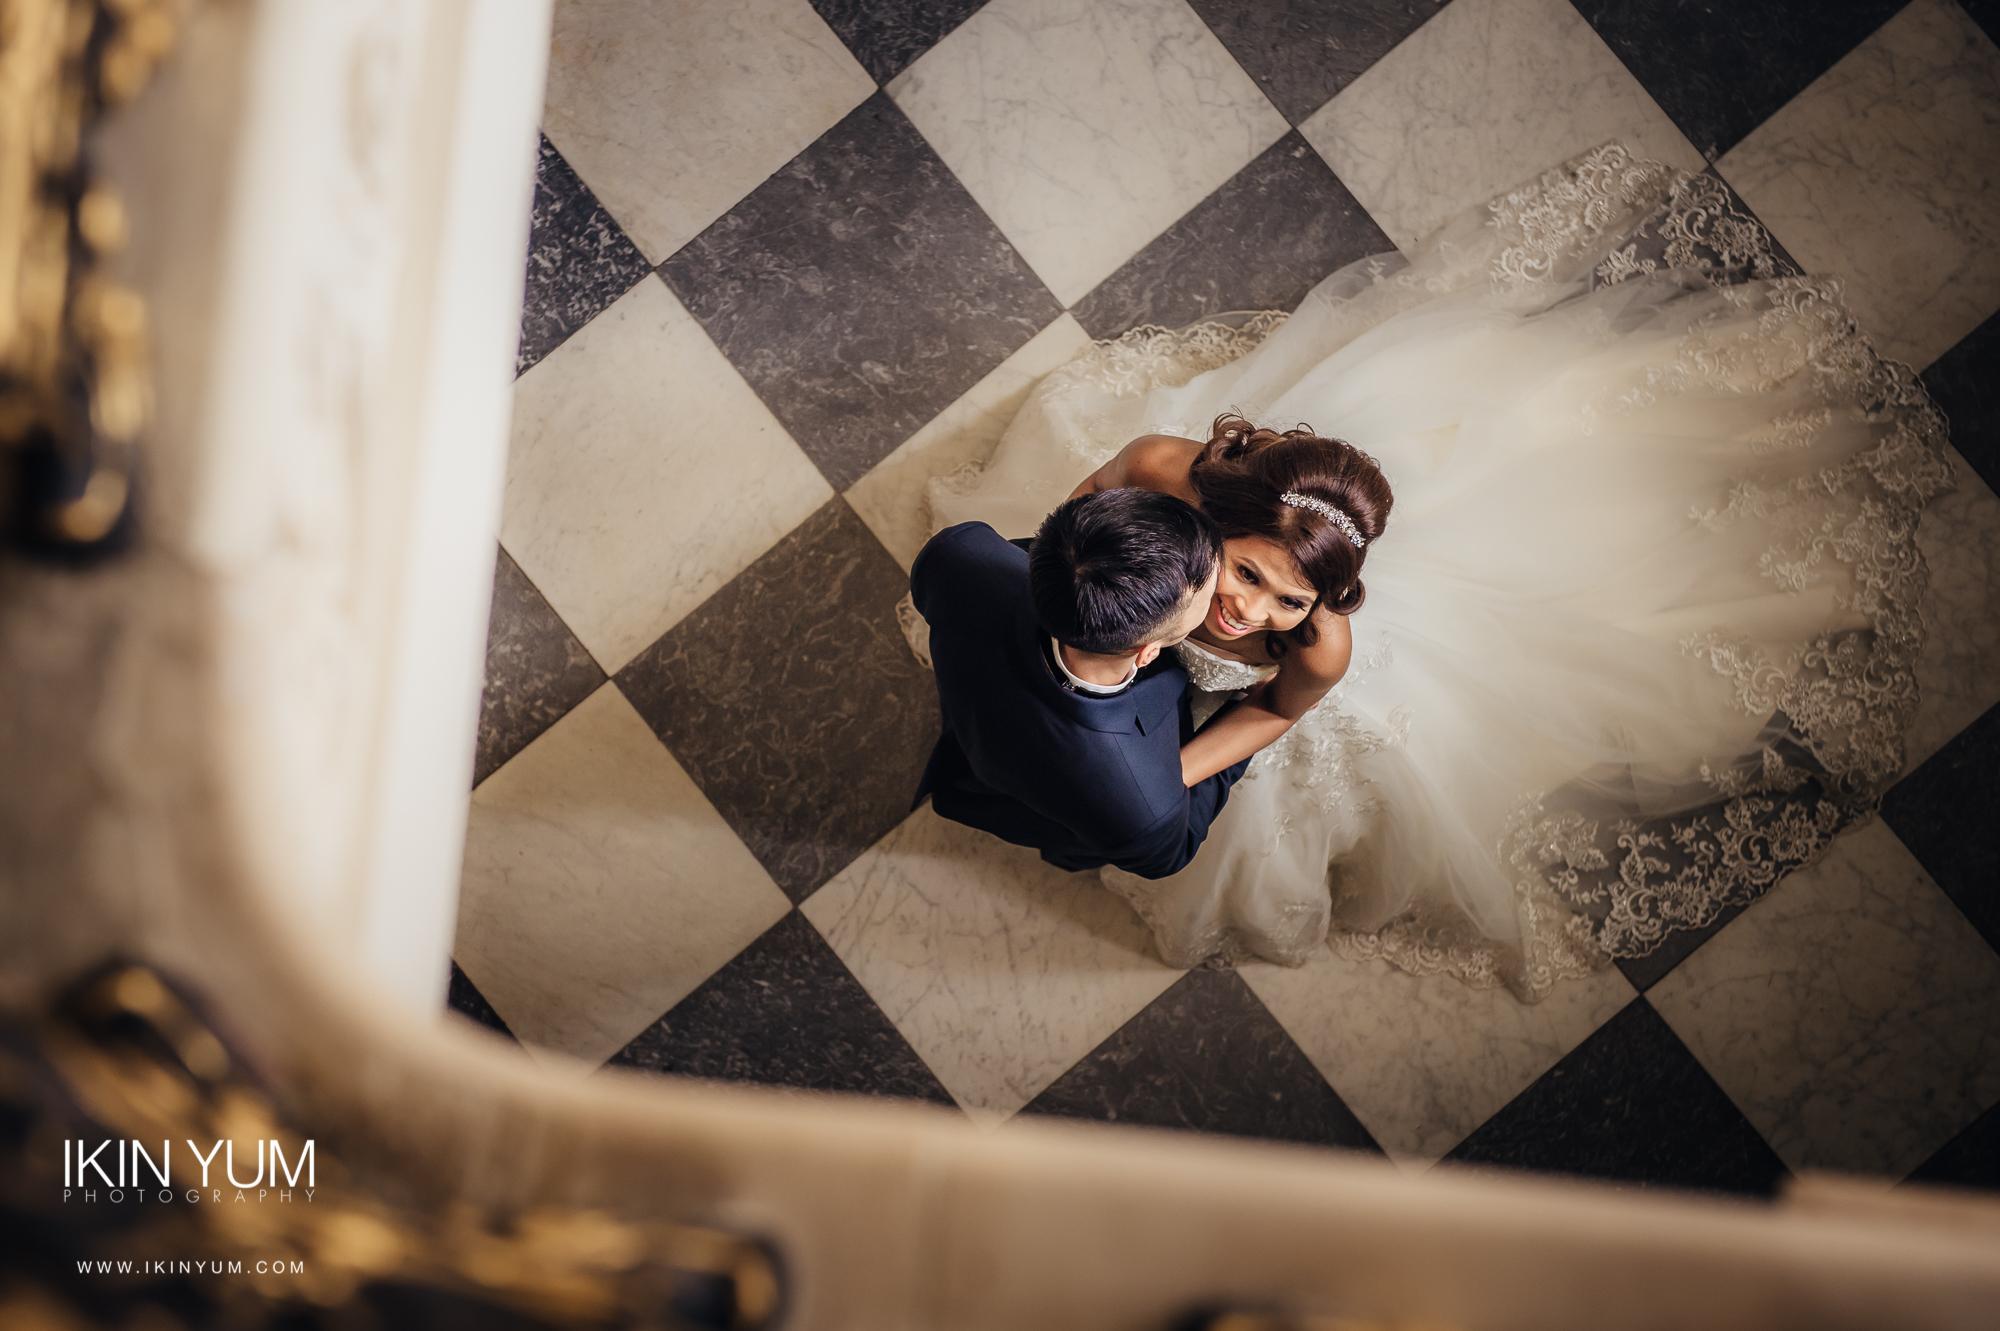 Hylands House Wedding - Ikin Yum Photography-100.jpg